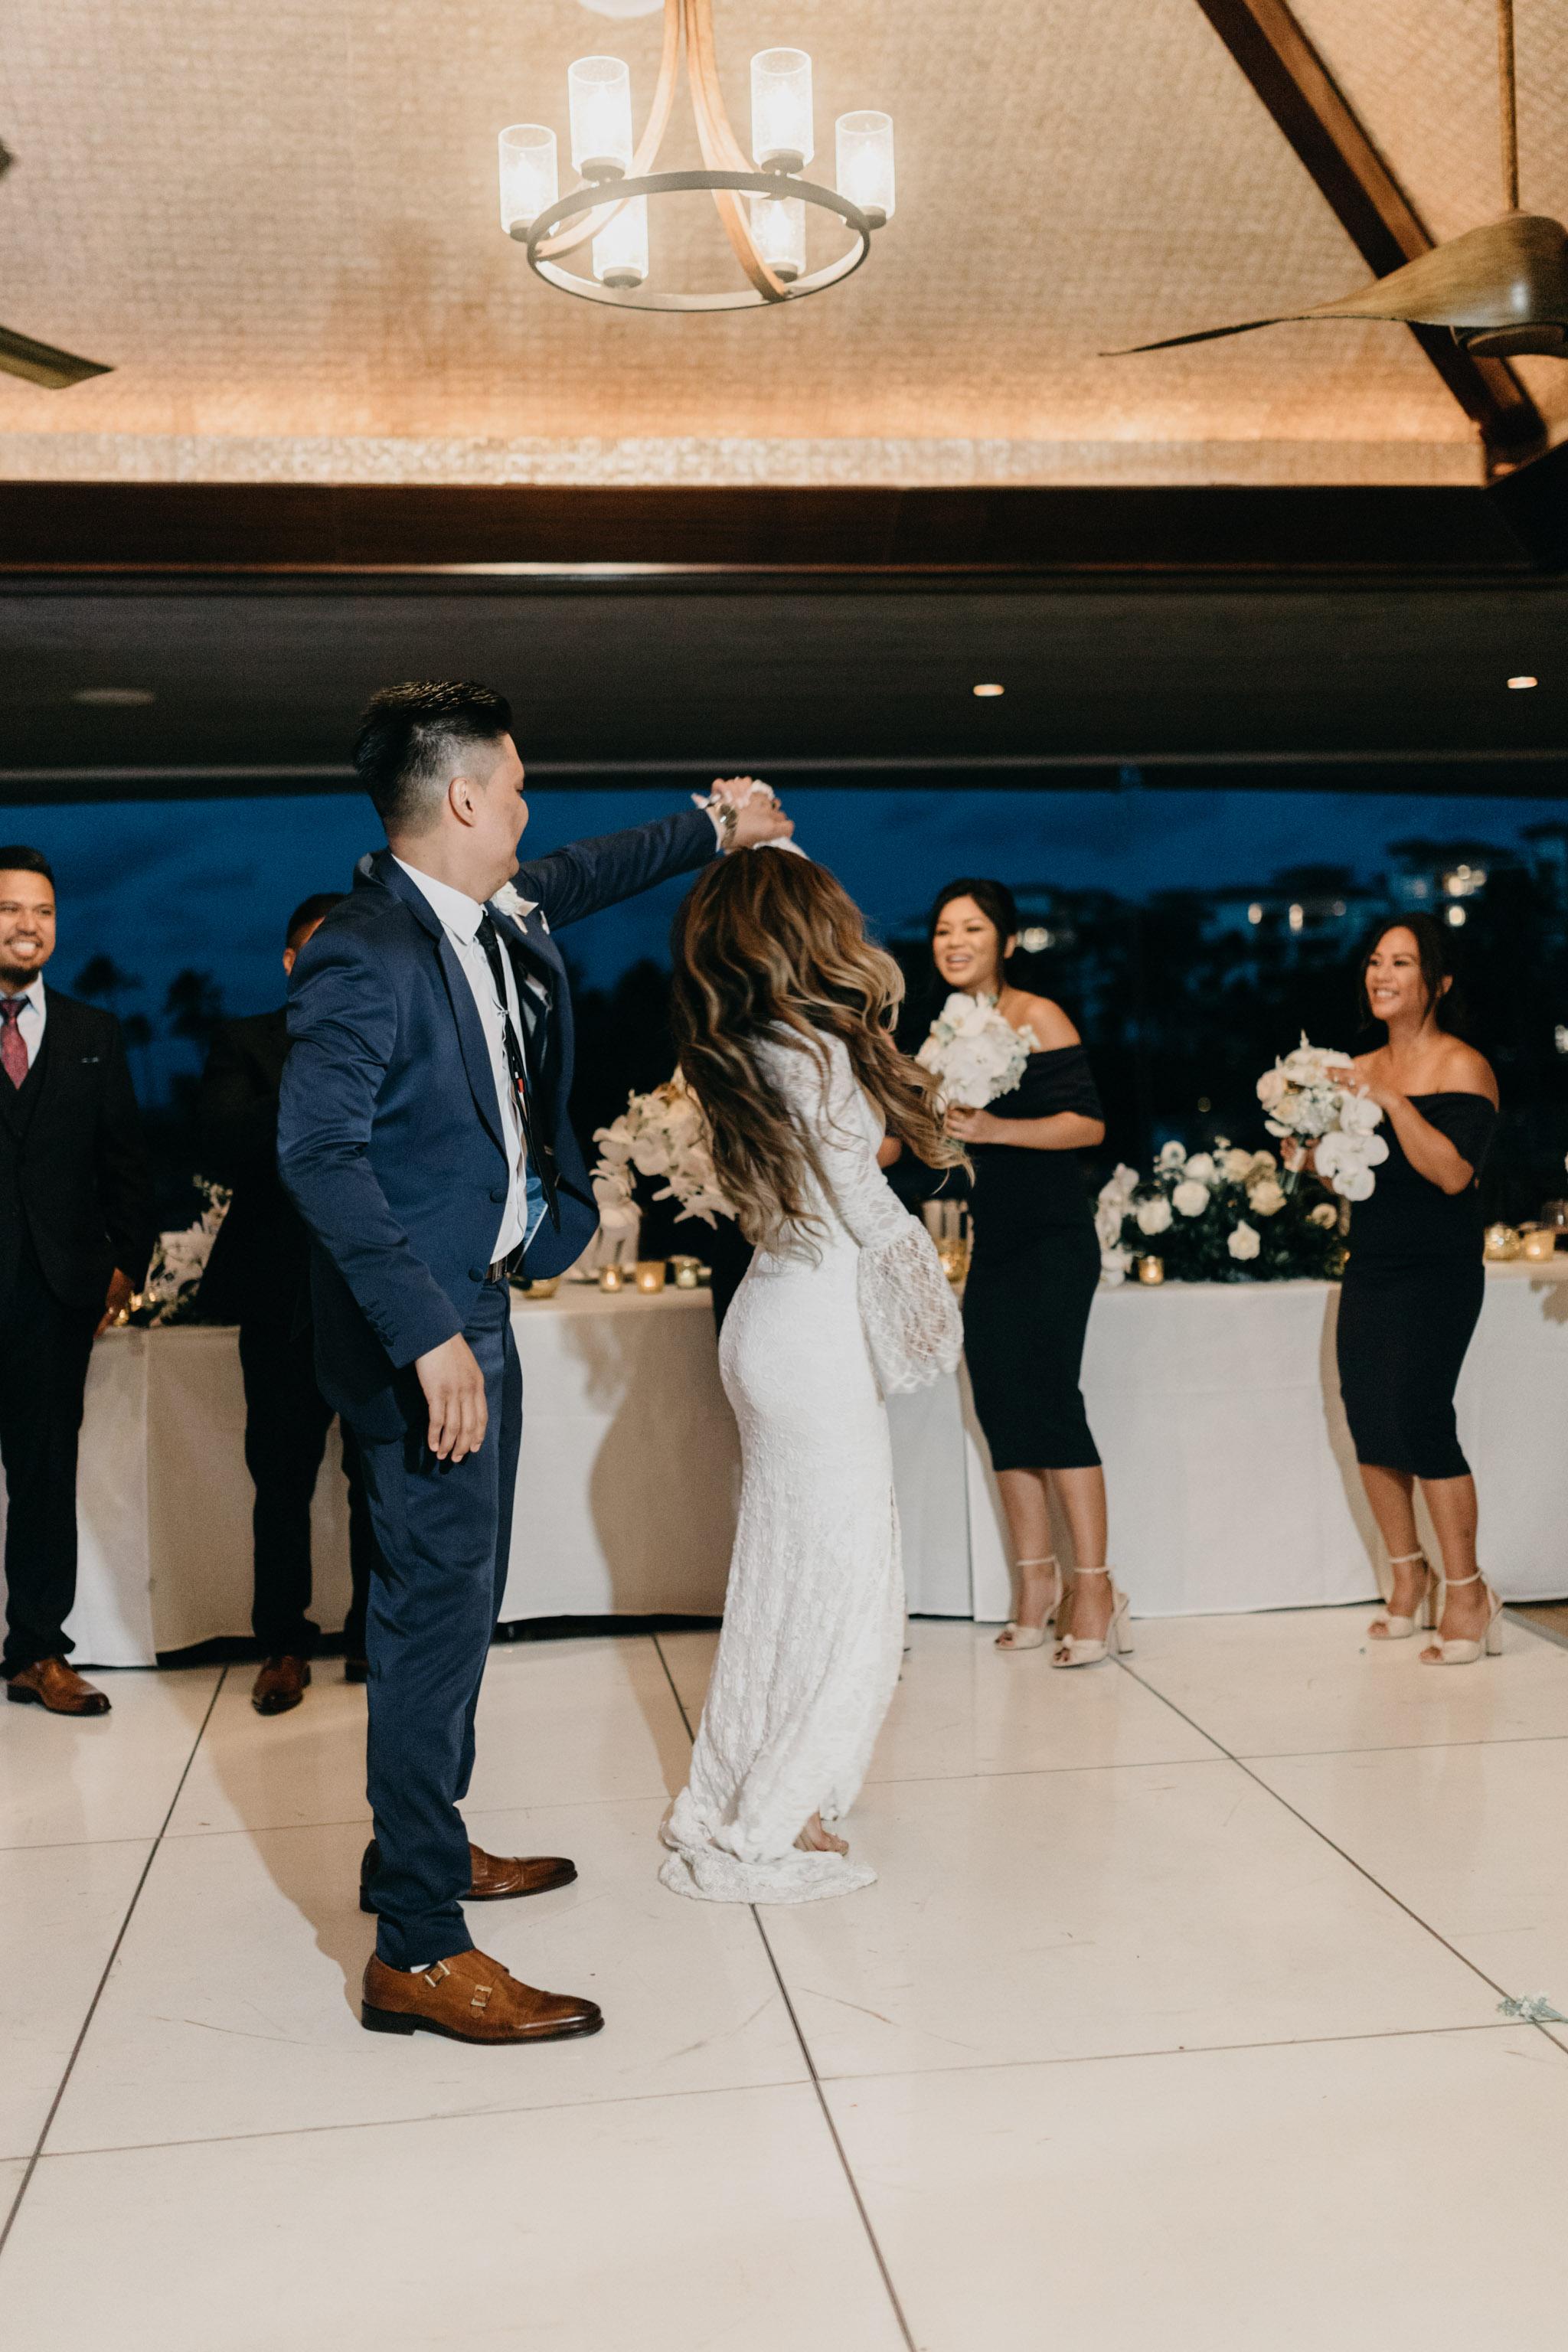 Bride & groom grand entrance idea   Merriman's Kapalua Maui wedding by Hawaii wedding photographer Desiree Leilani